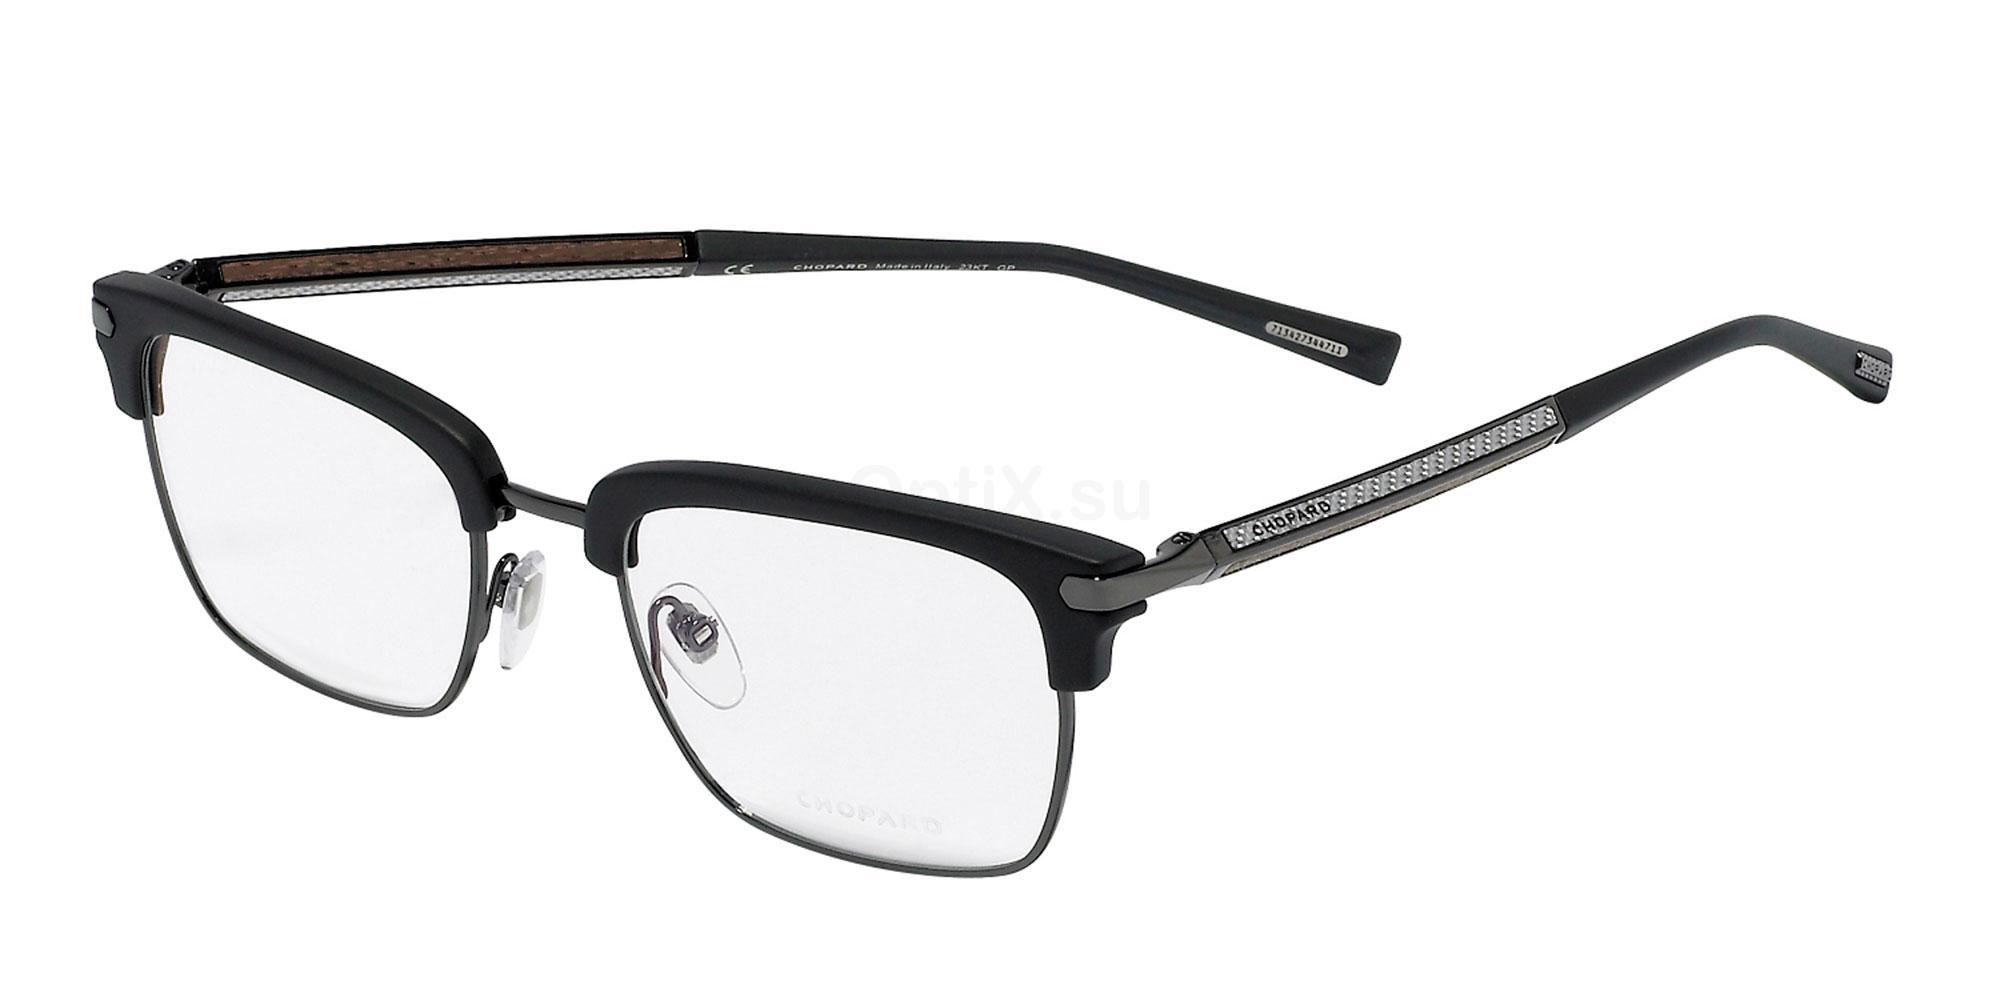 0568 VCHC57 Glasses, Chopard